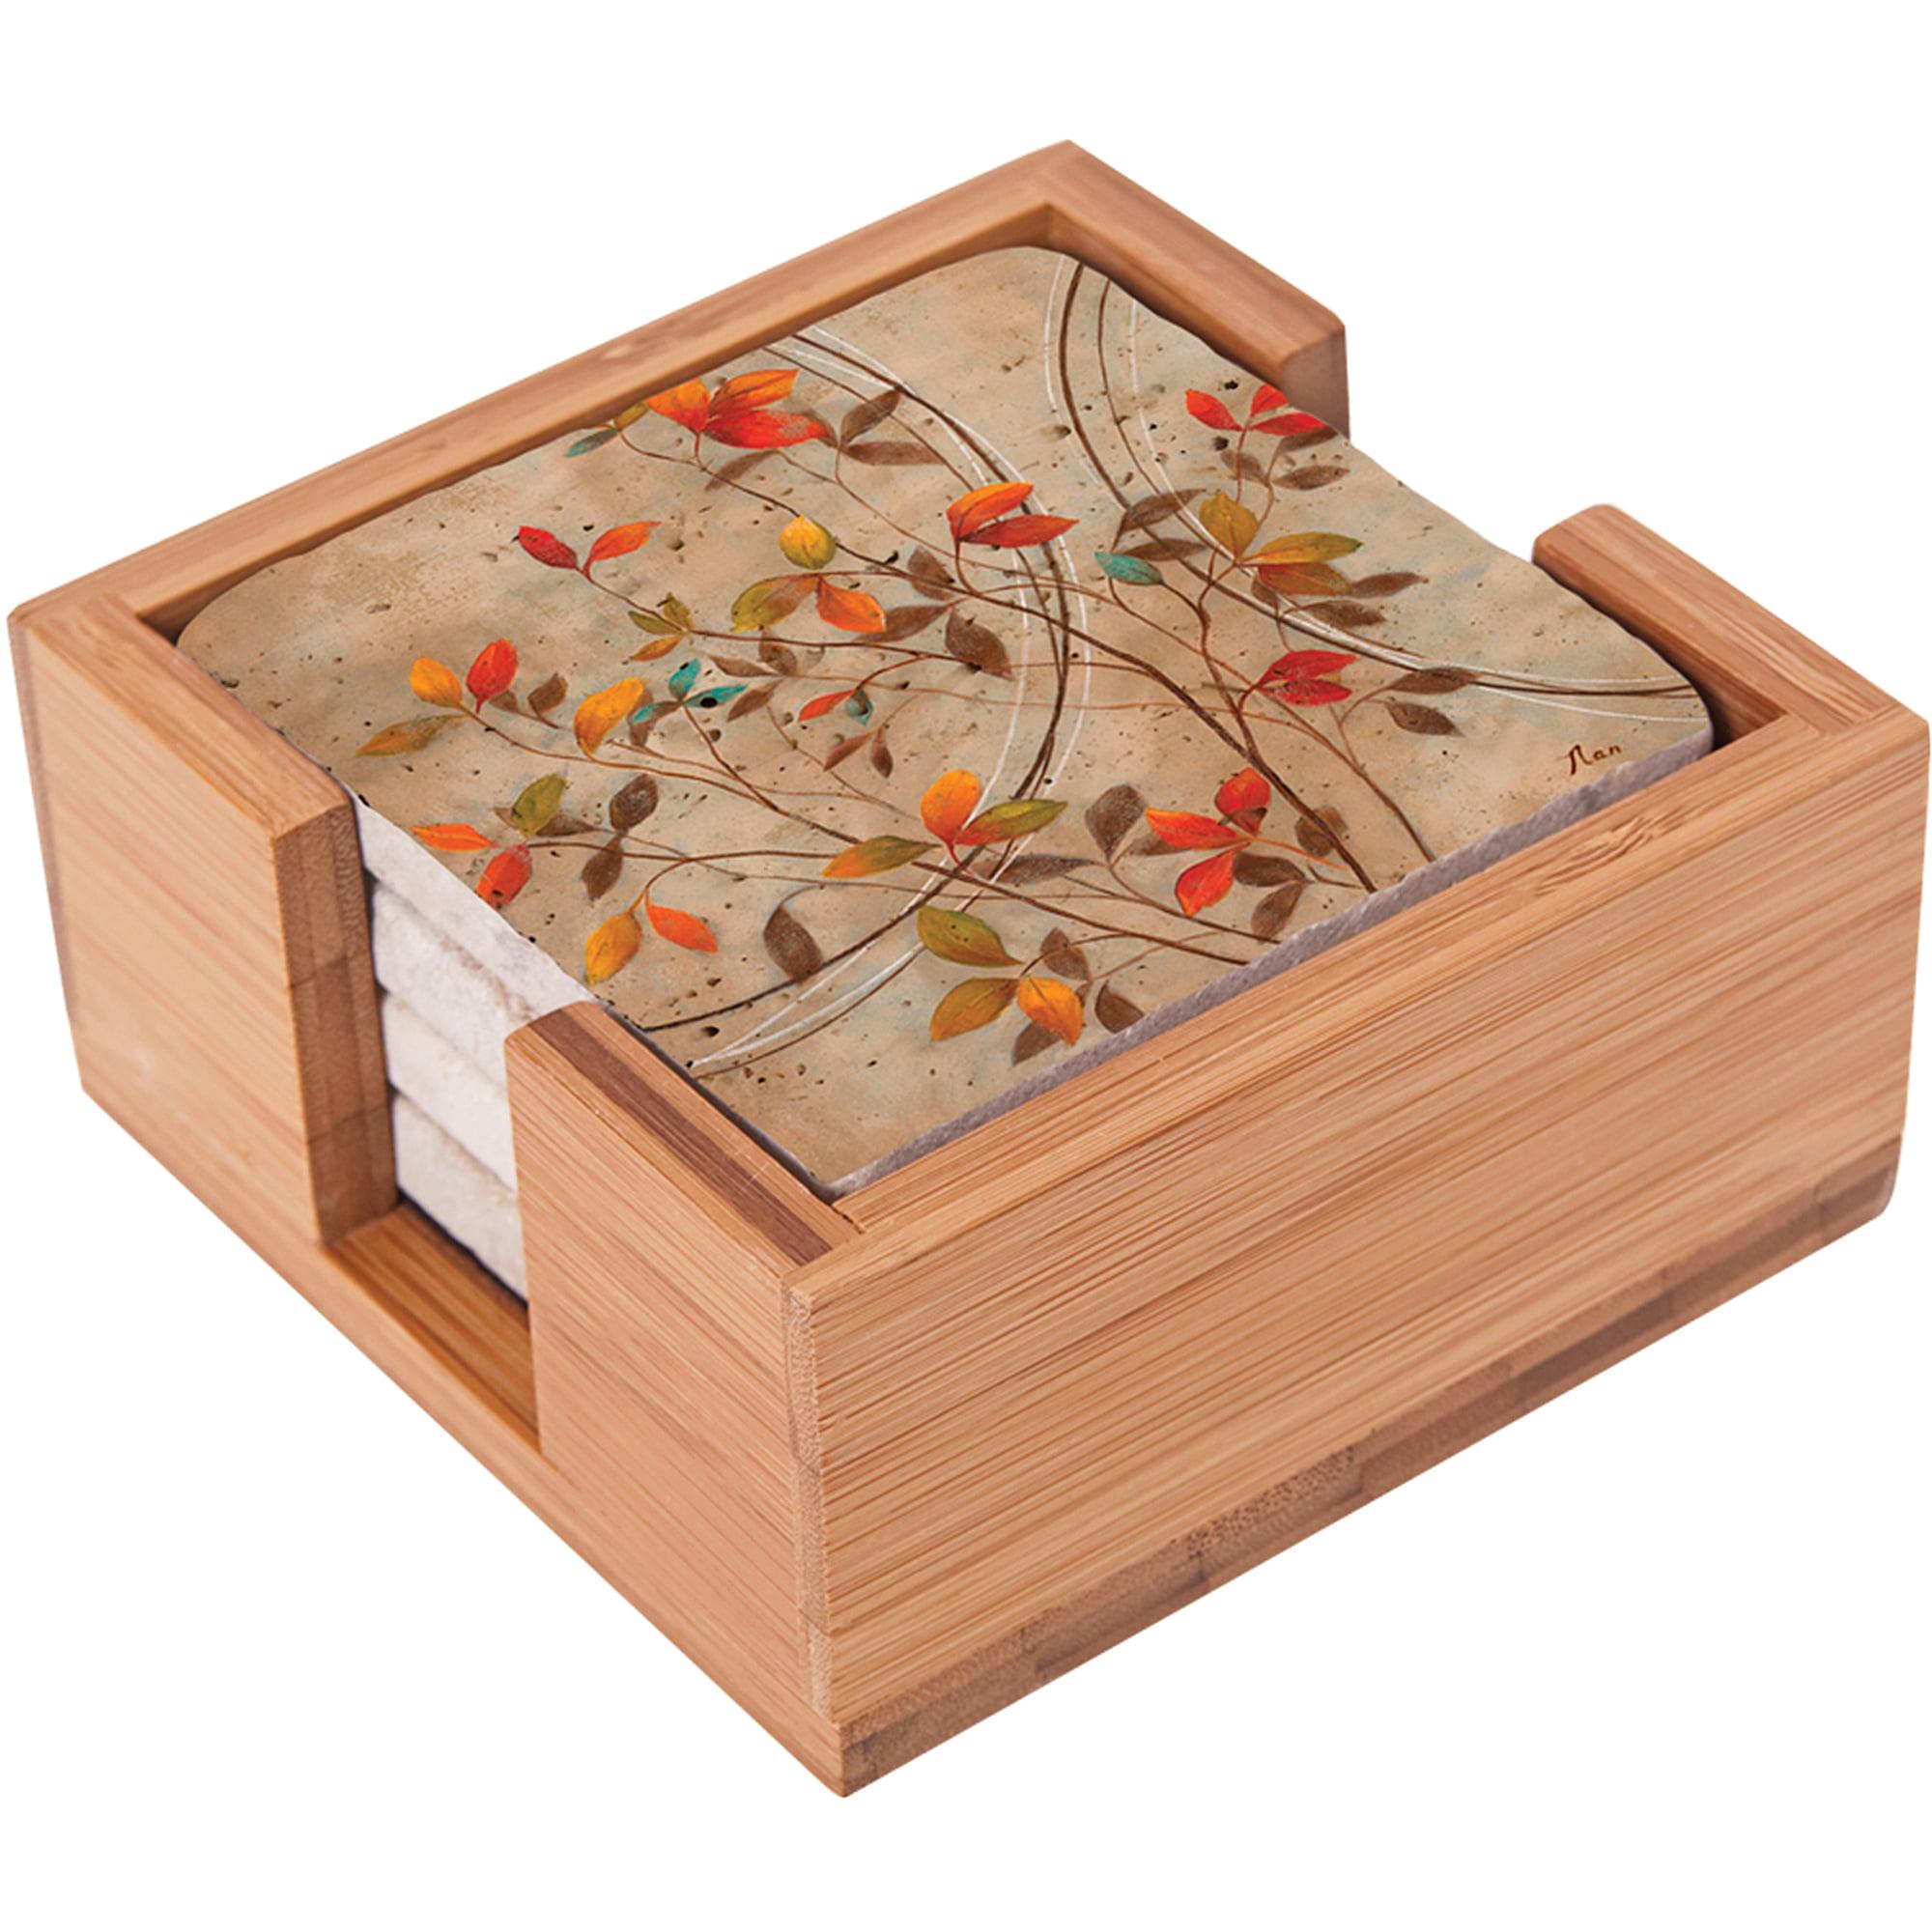 Thirstystone Impressions Square Bamboo Holder for Travertine & Thirstystone Impressions Drink Coasters